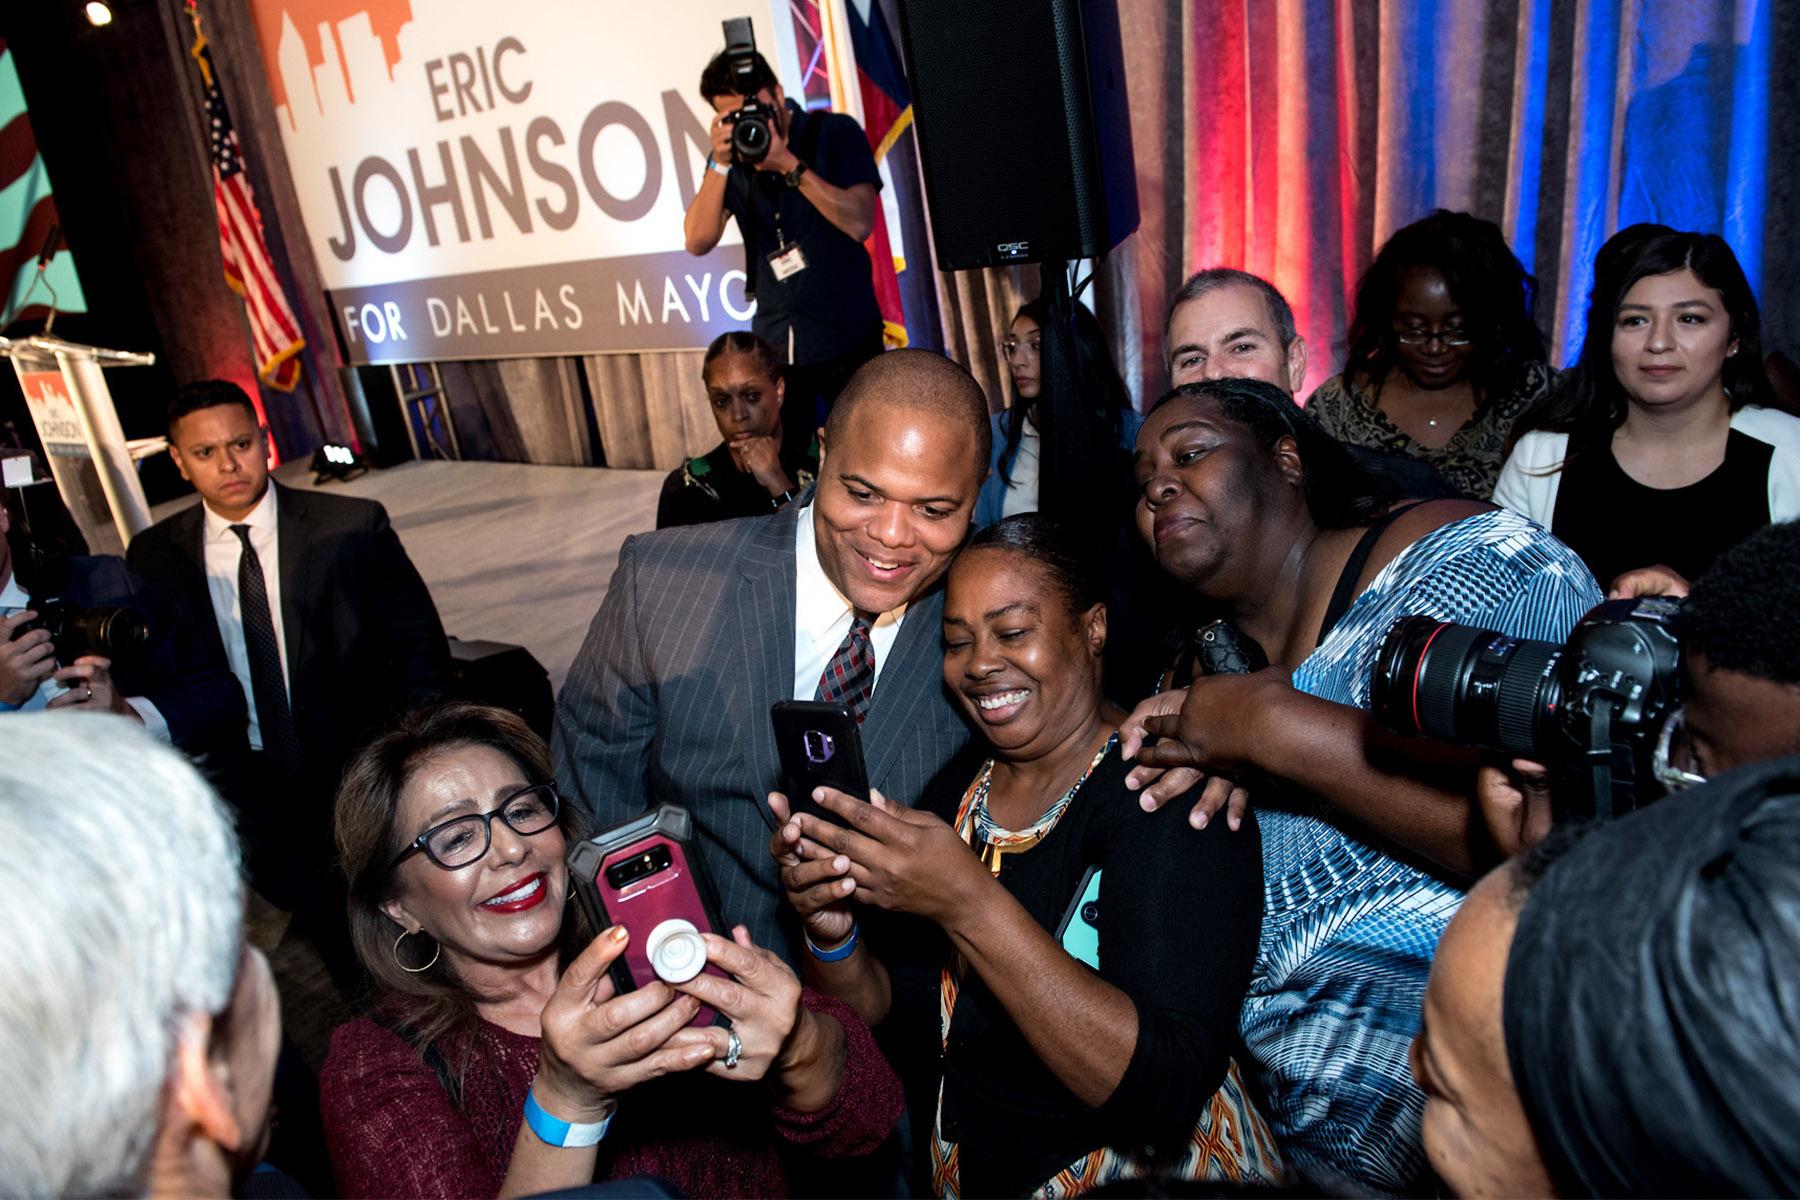 Eric Johnson Mayoral Party